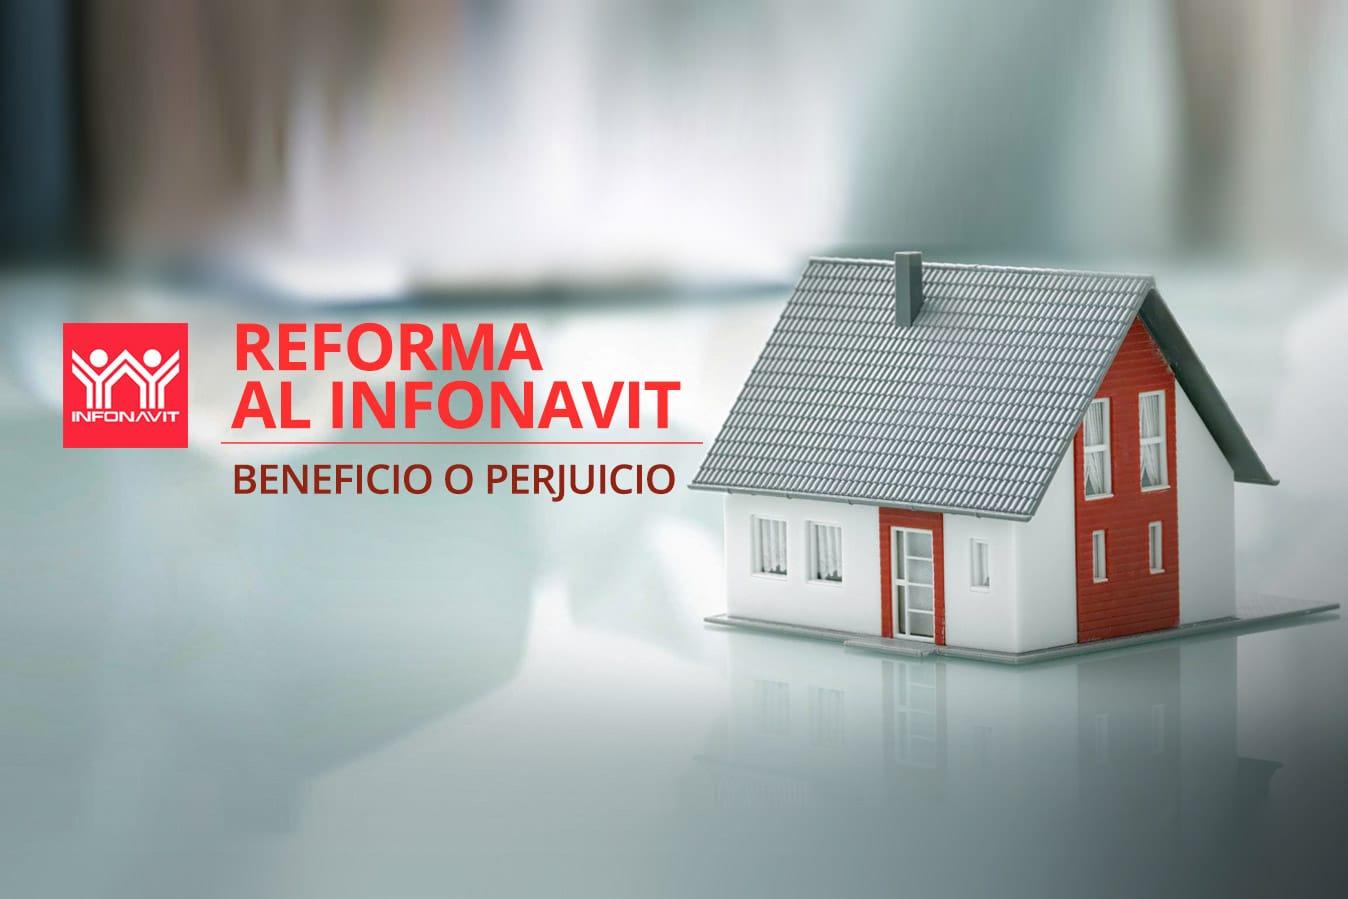 reforma infonavit